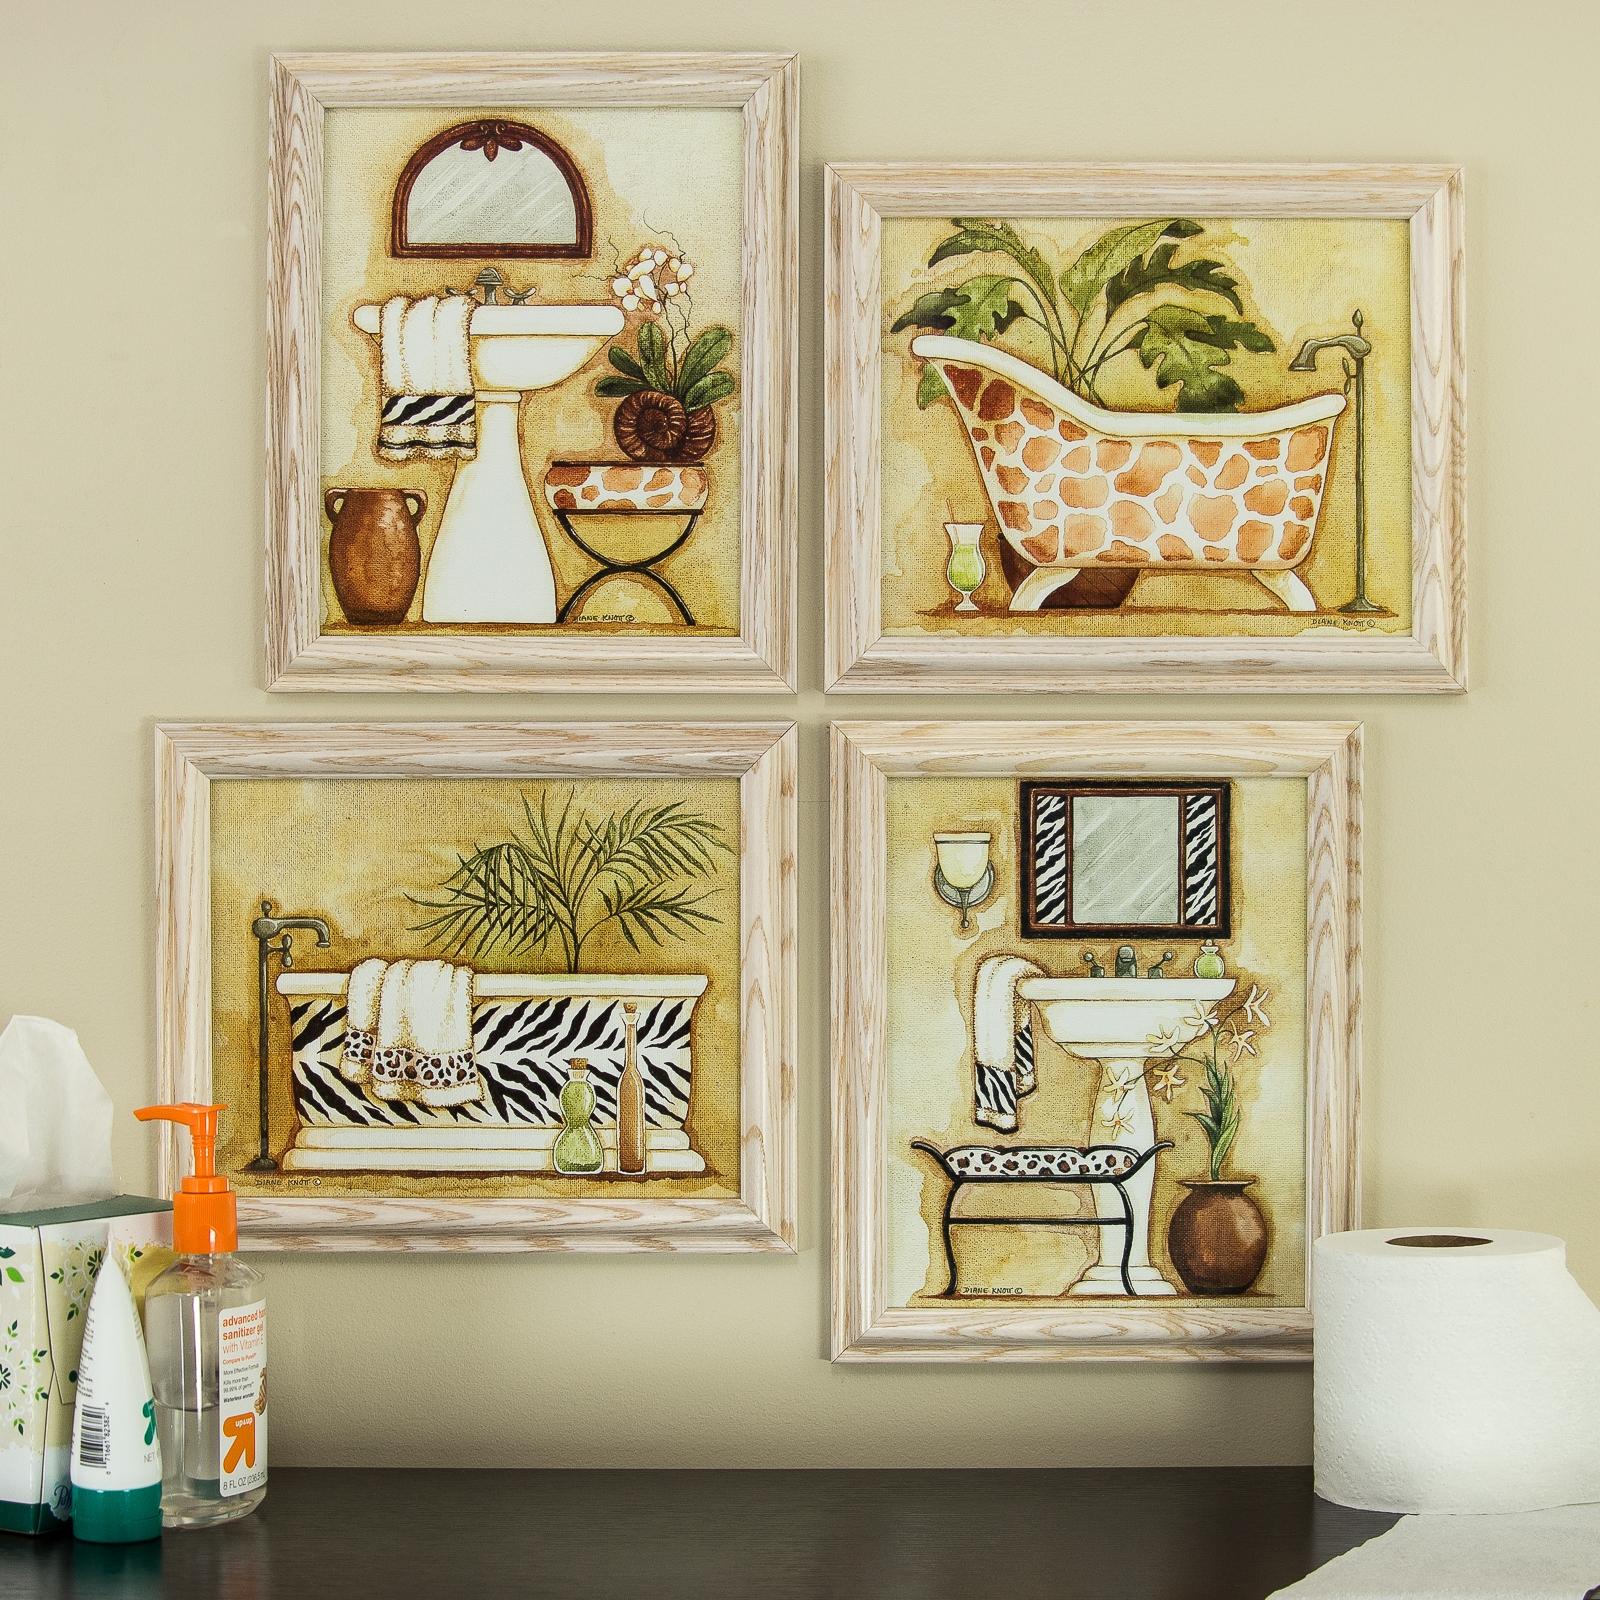 framed art for bathroom walls